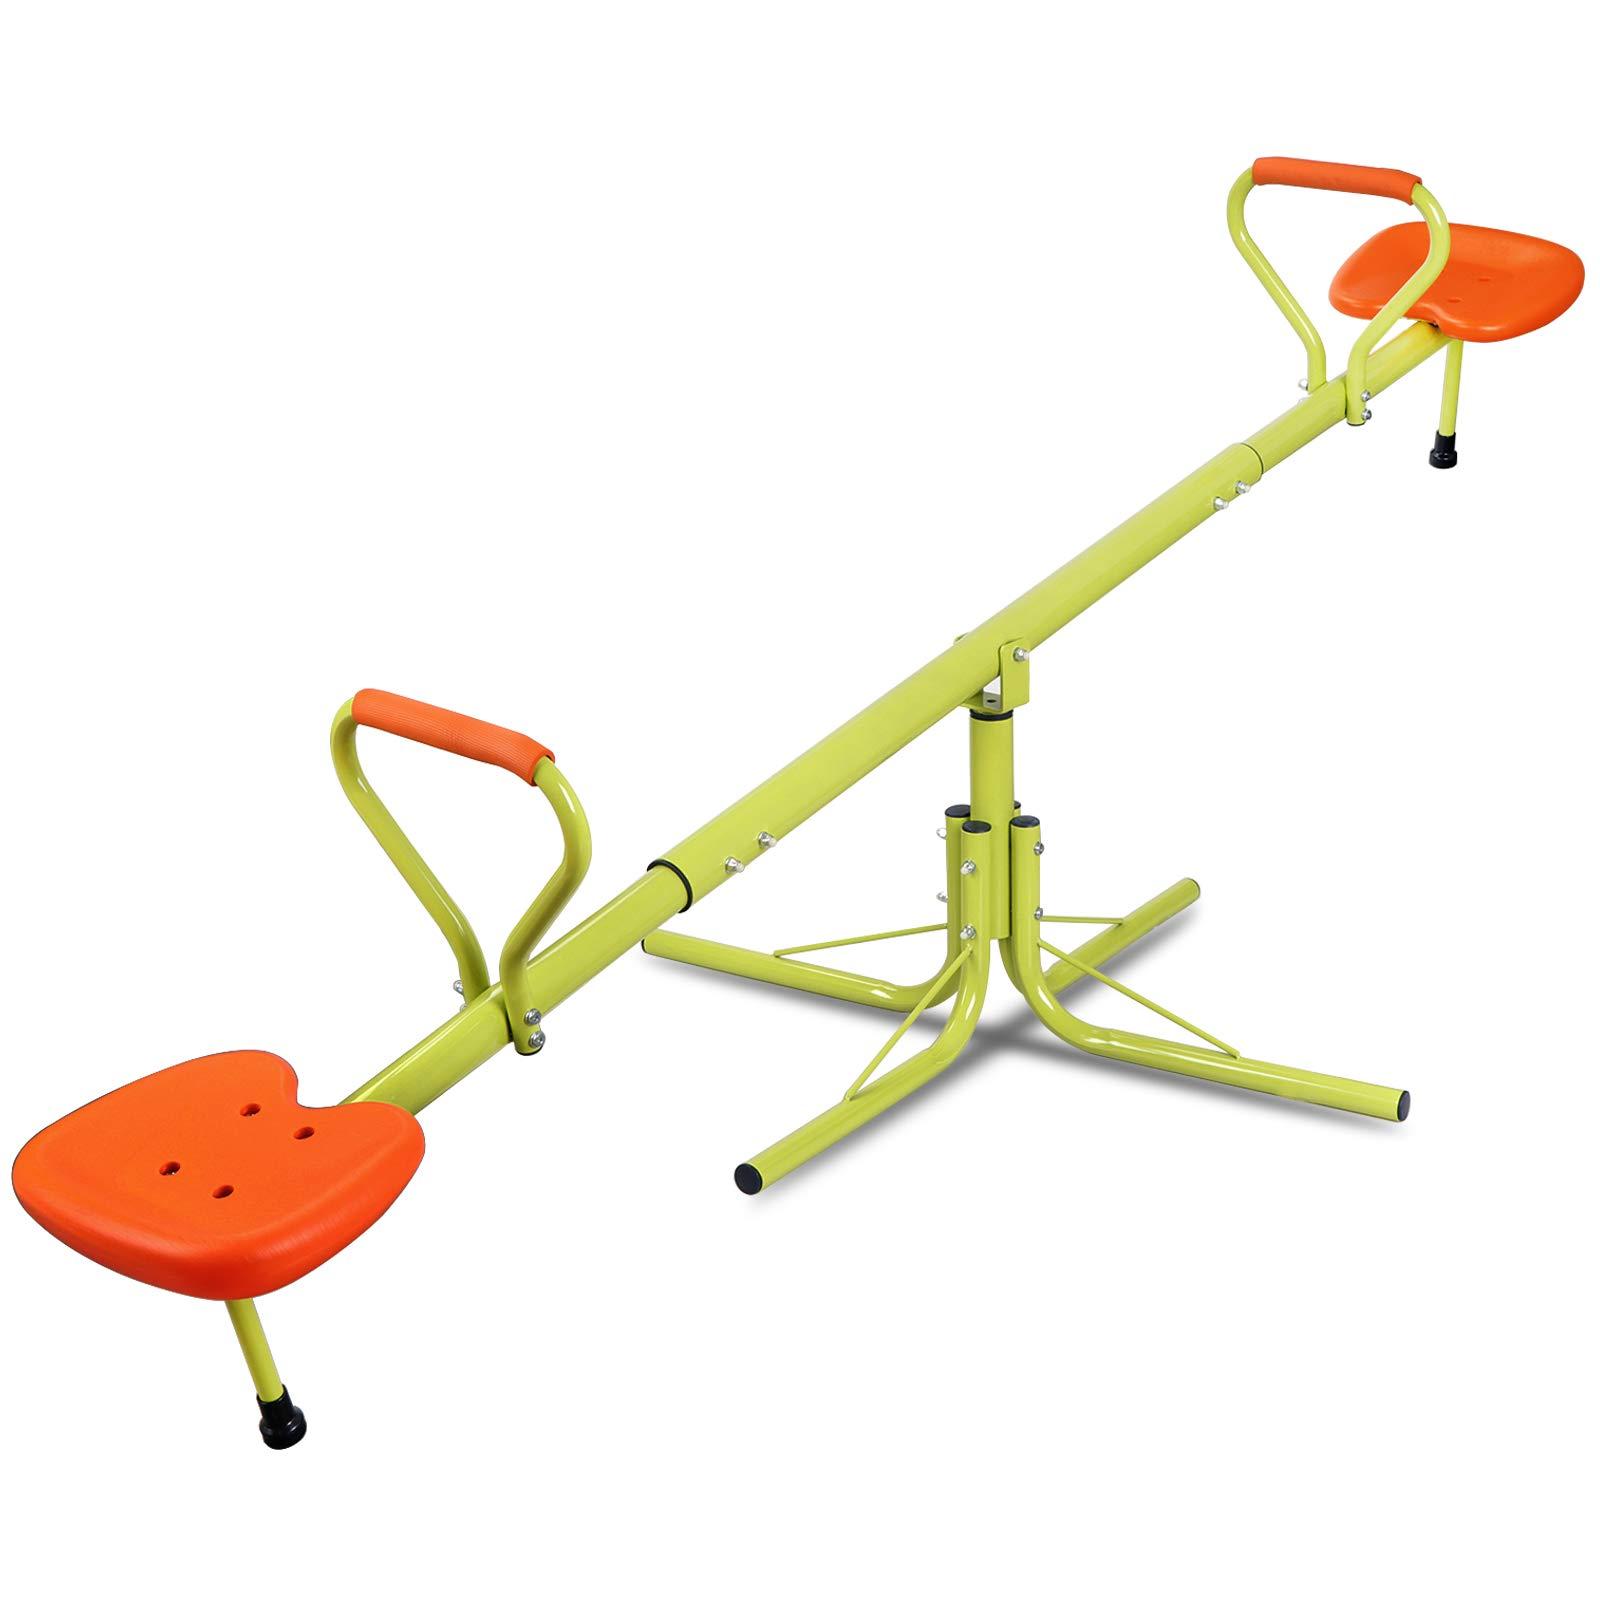 Nova Microdermabrasion Kids Seesaw Swivel Teeter-Totter Home Playground Equipment, 360 Degrees Rotating Safe, Outdoor Fun for Kids, Toddlers, Boys, Children (#1)